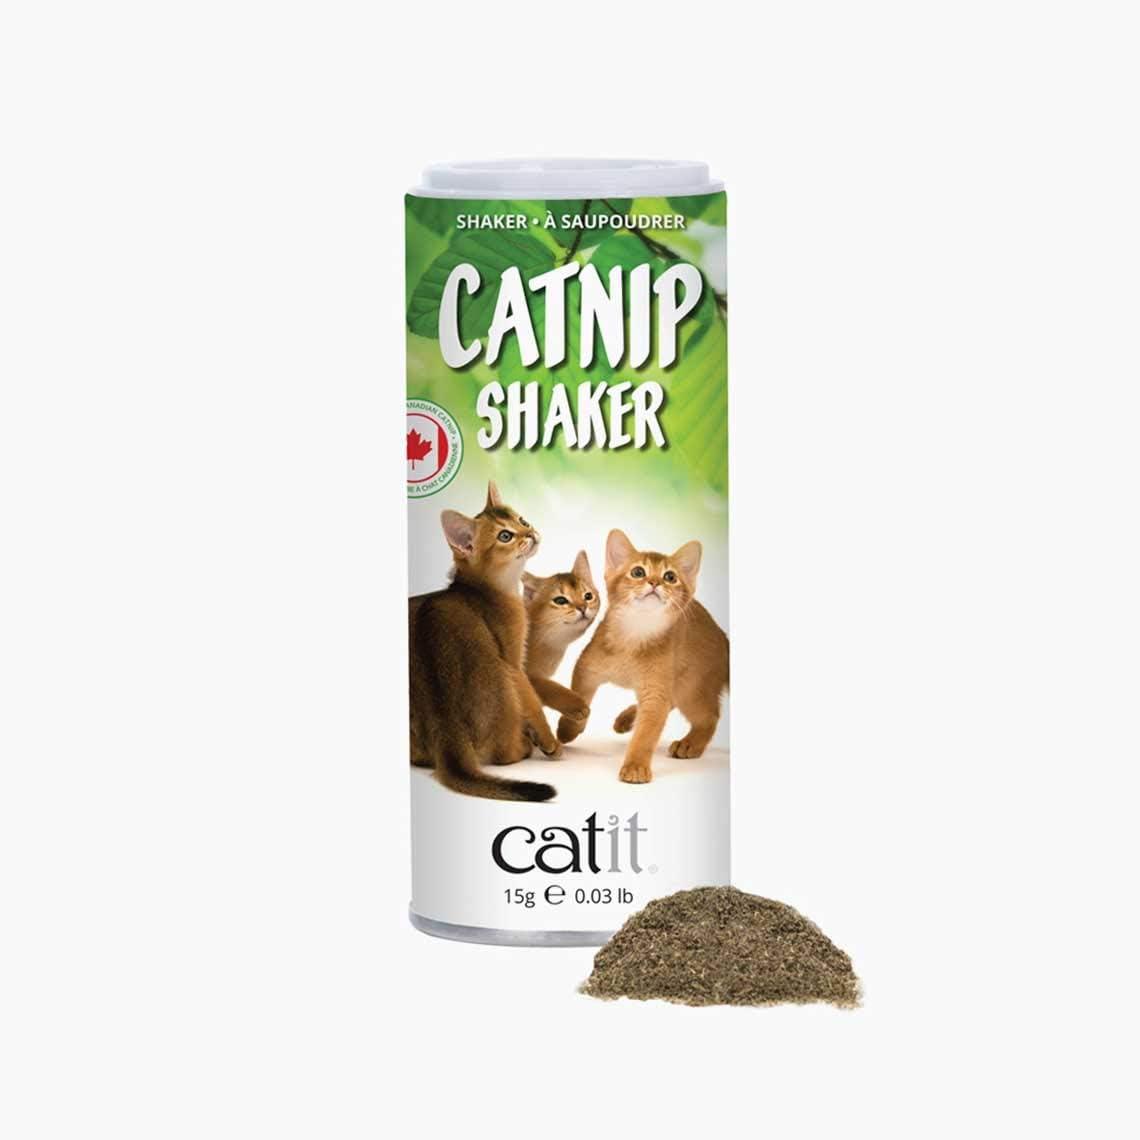 Catit Senses 2.0, Catnipfor Cats